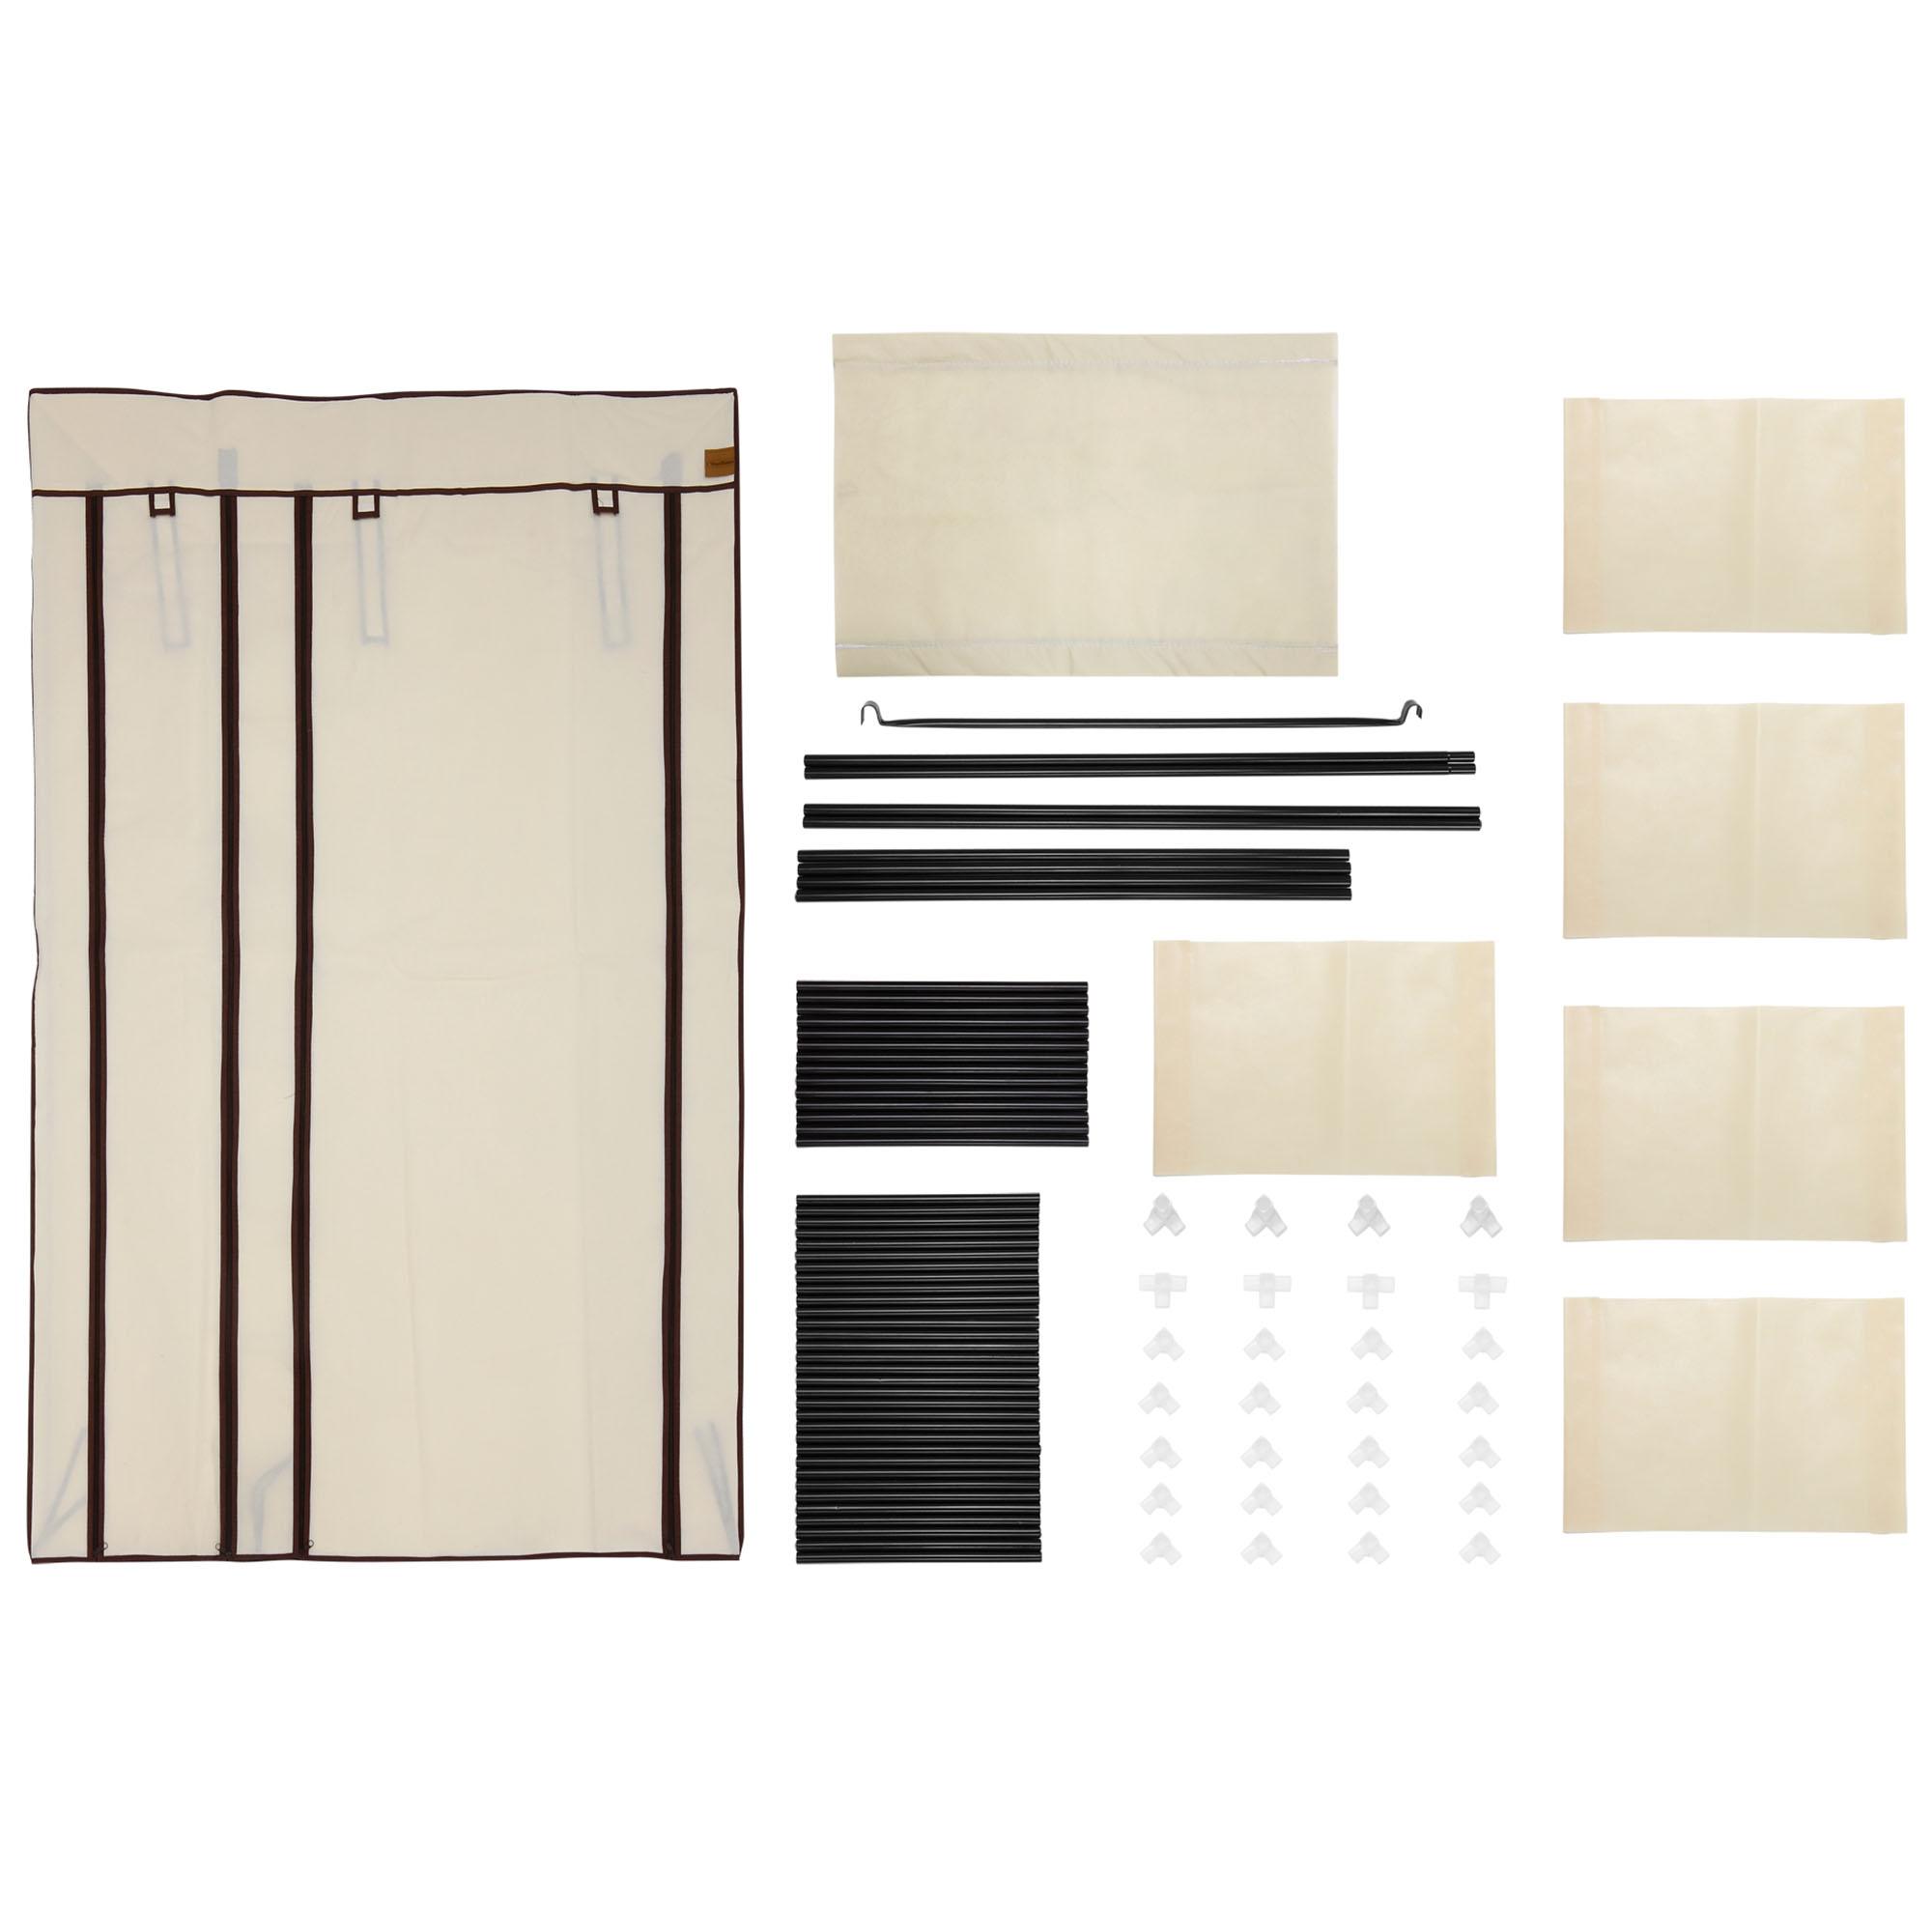 Canvas Storage Boxes For Wardrobes: VonHaus Double Canvas Effect Wardrobe Clothes Hanging Rail